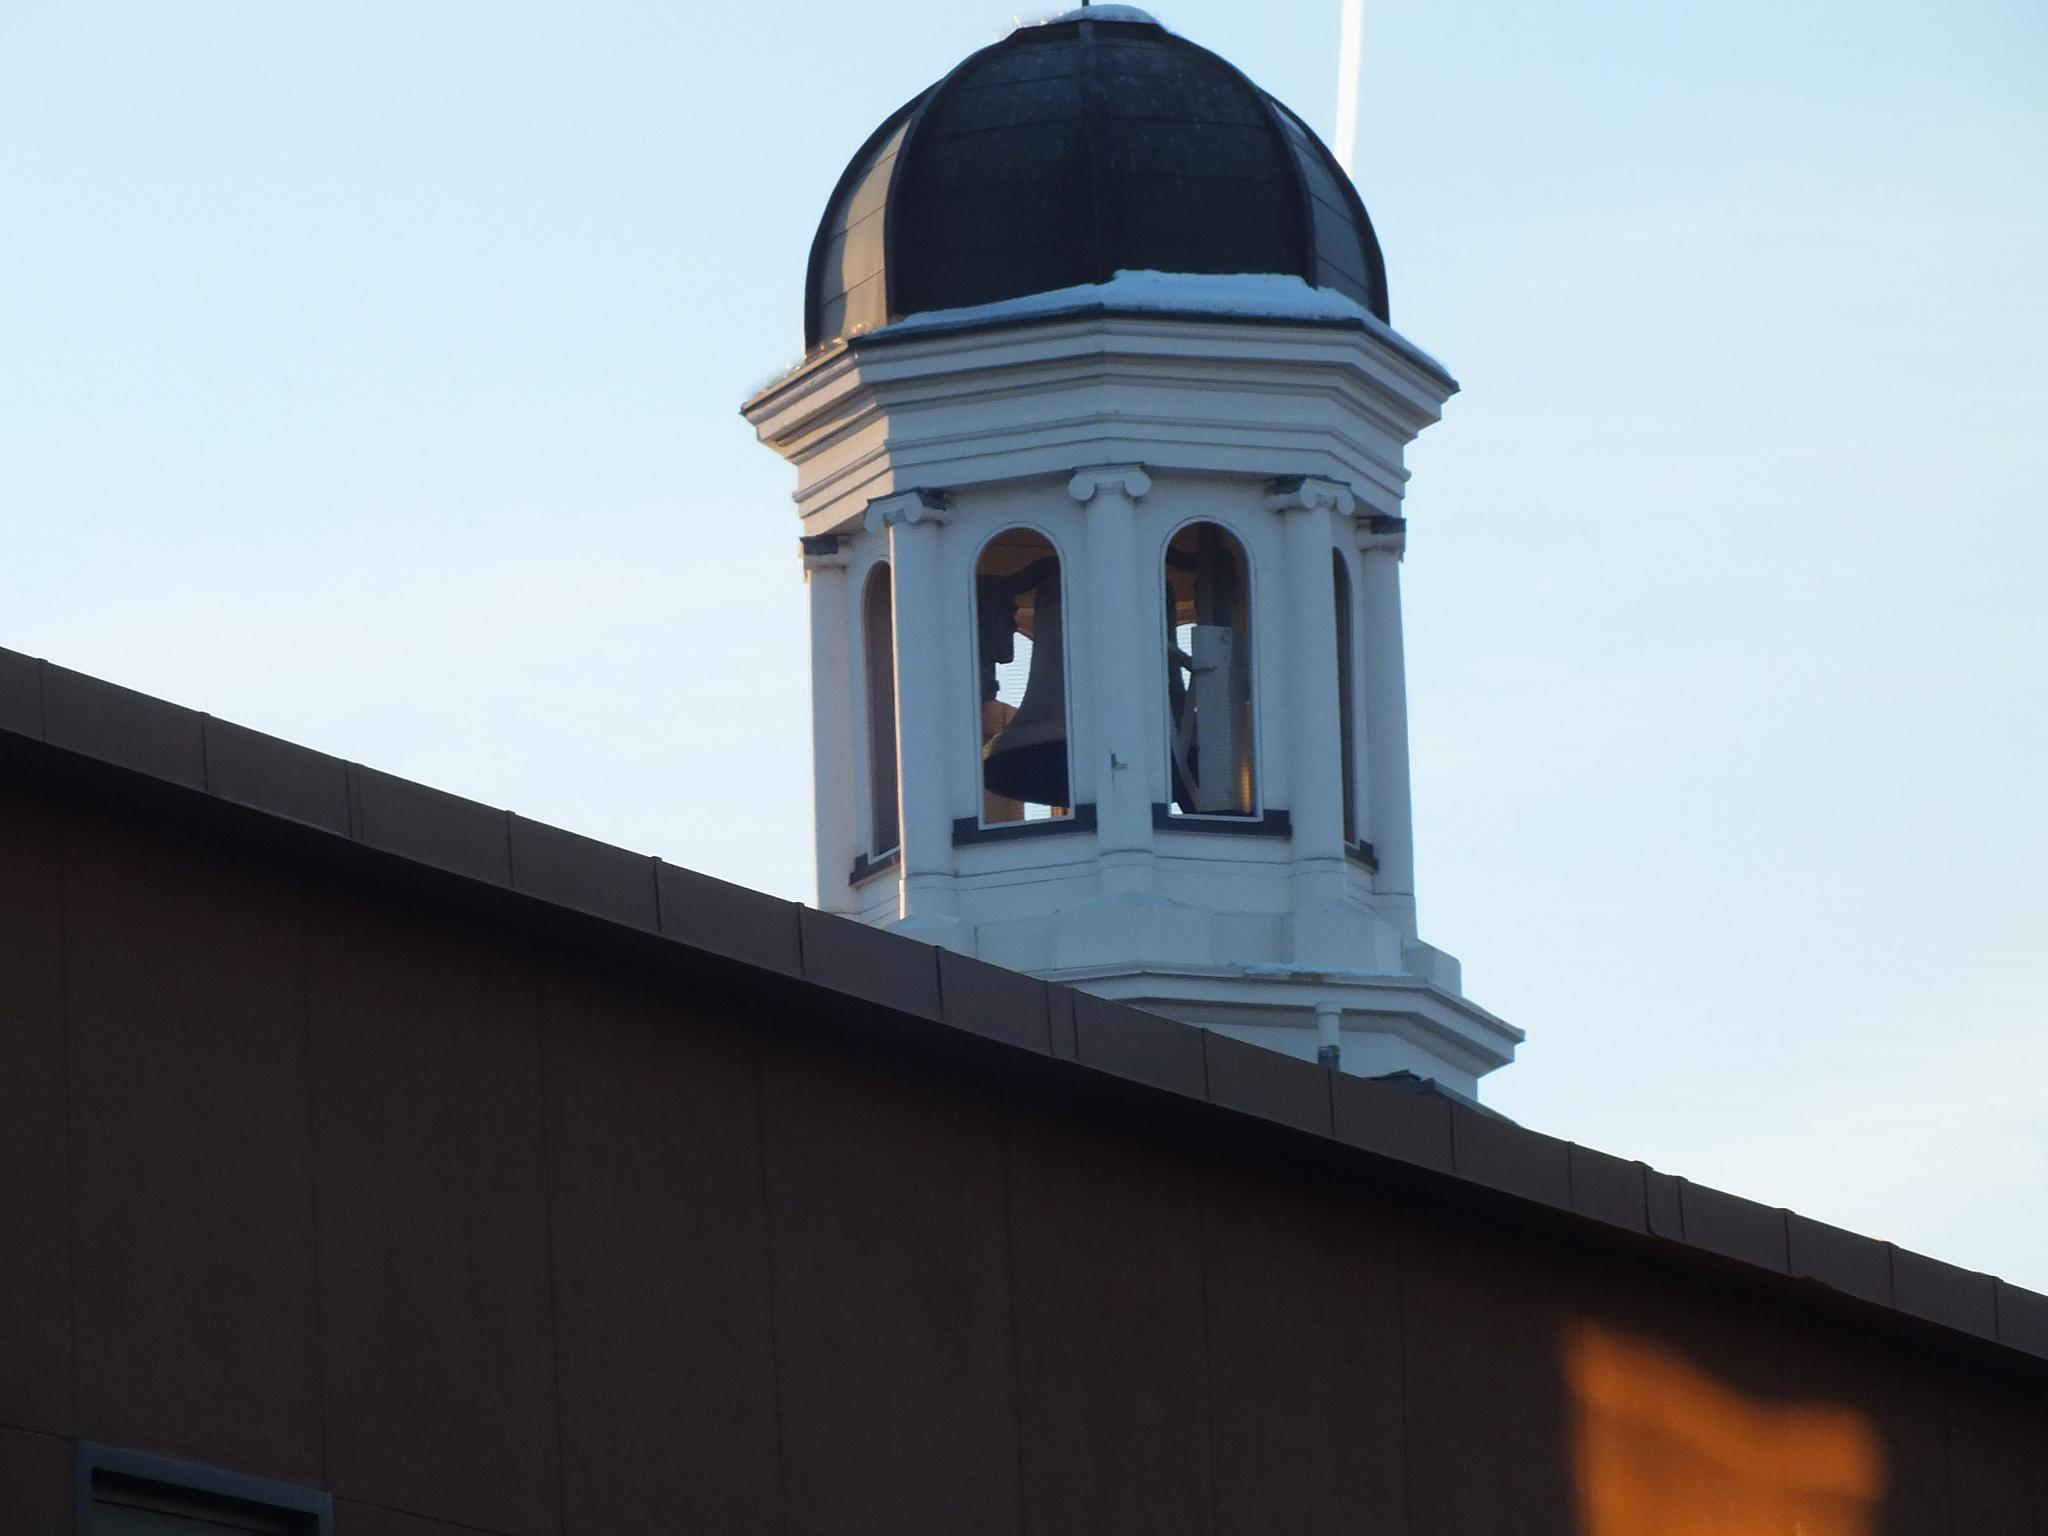 Ring that bell by RegSoper